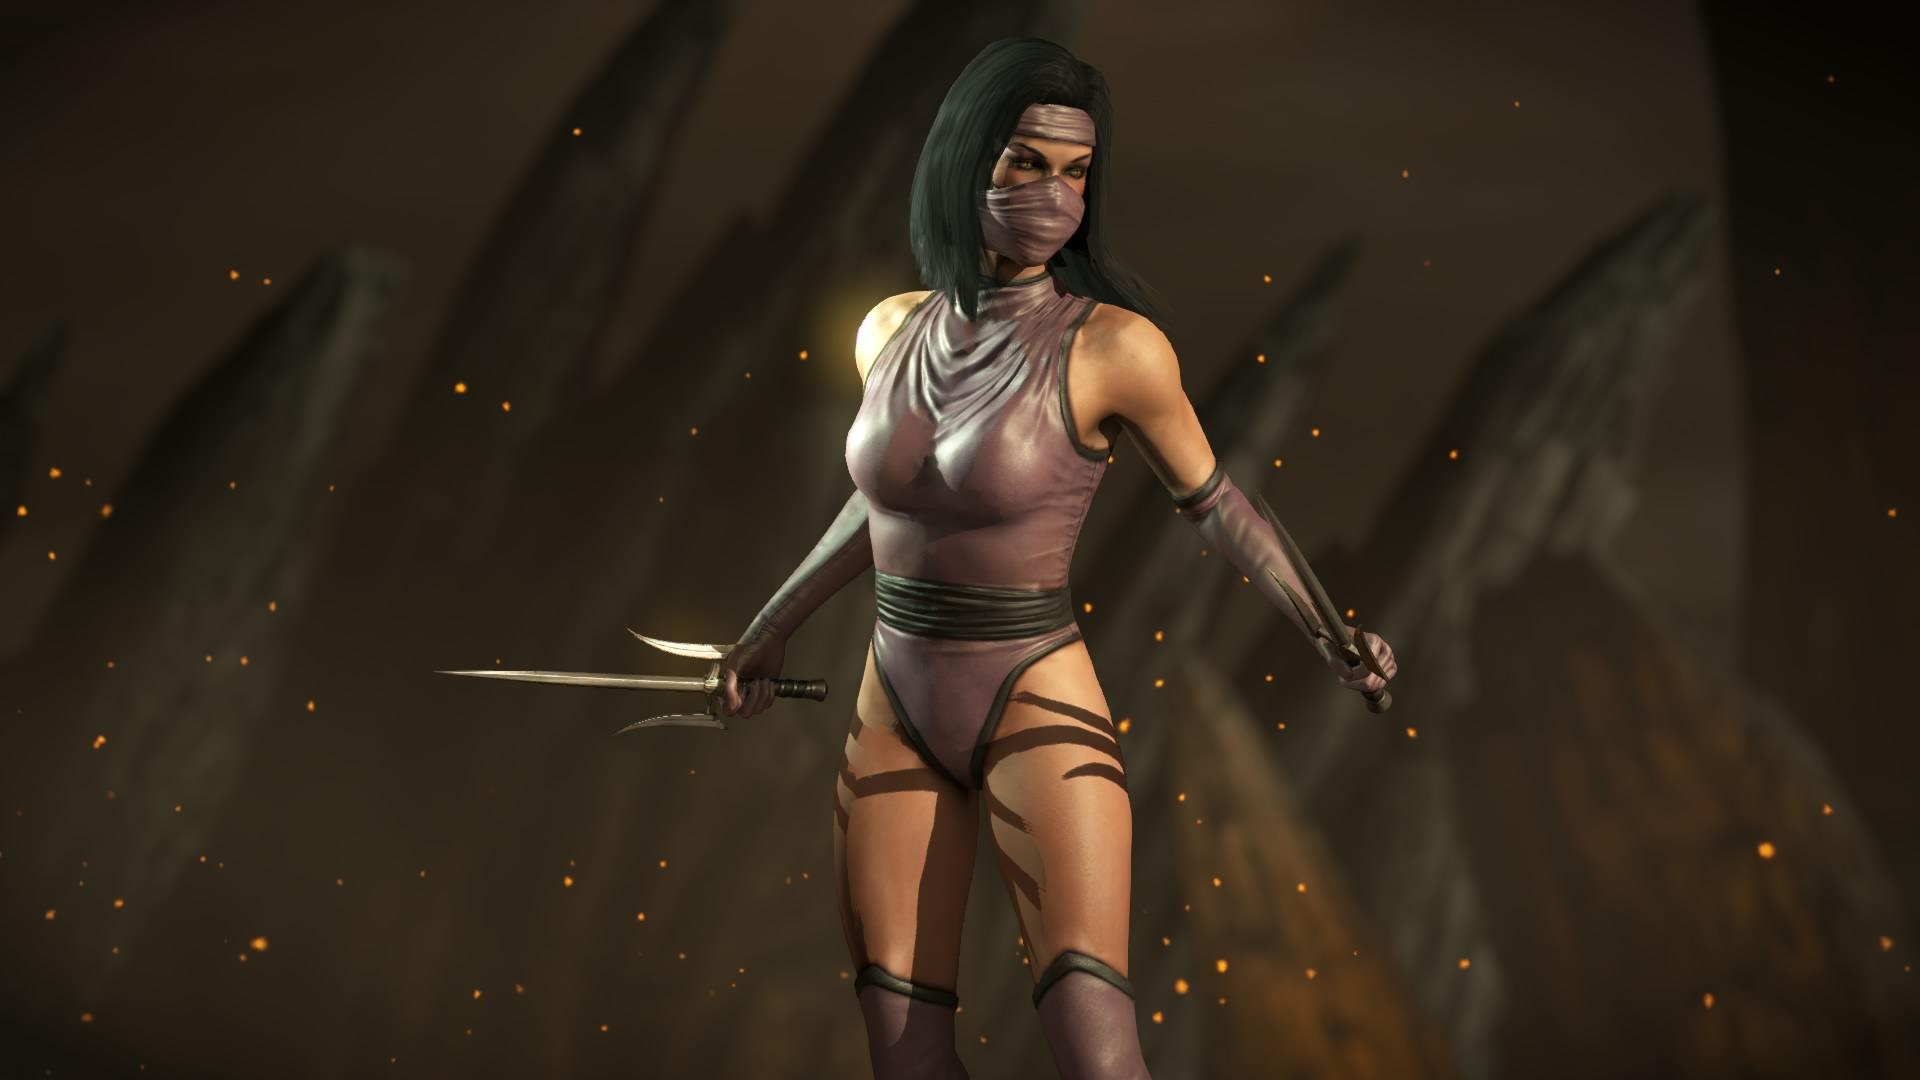 Mortal Kombat X Official Game Art